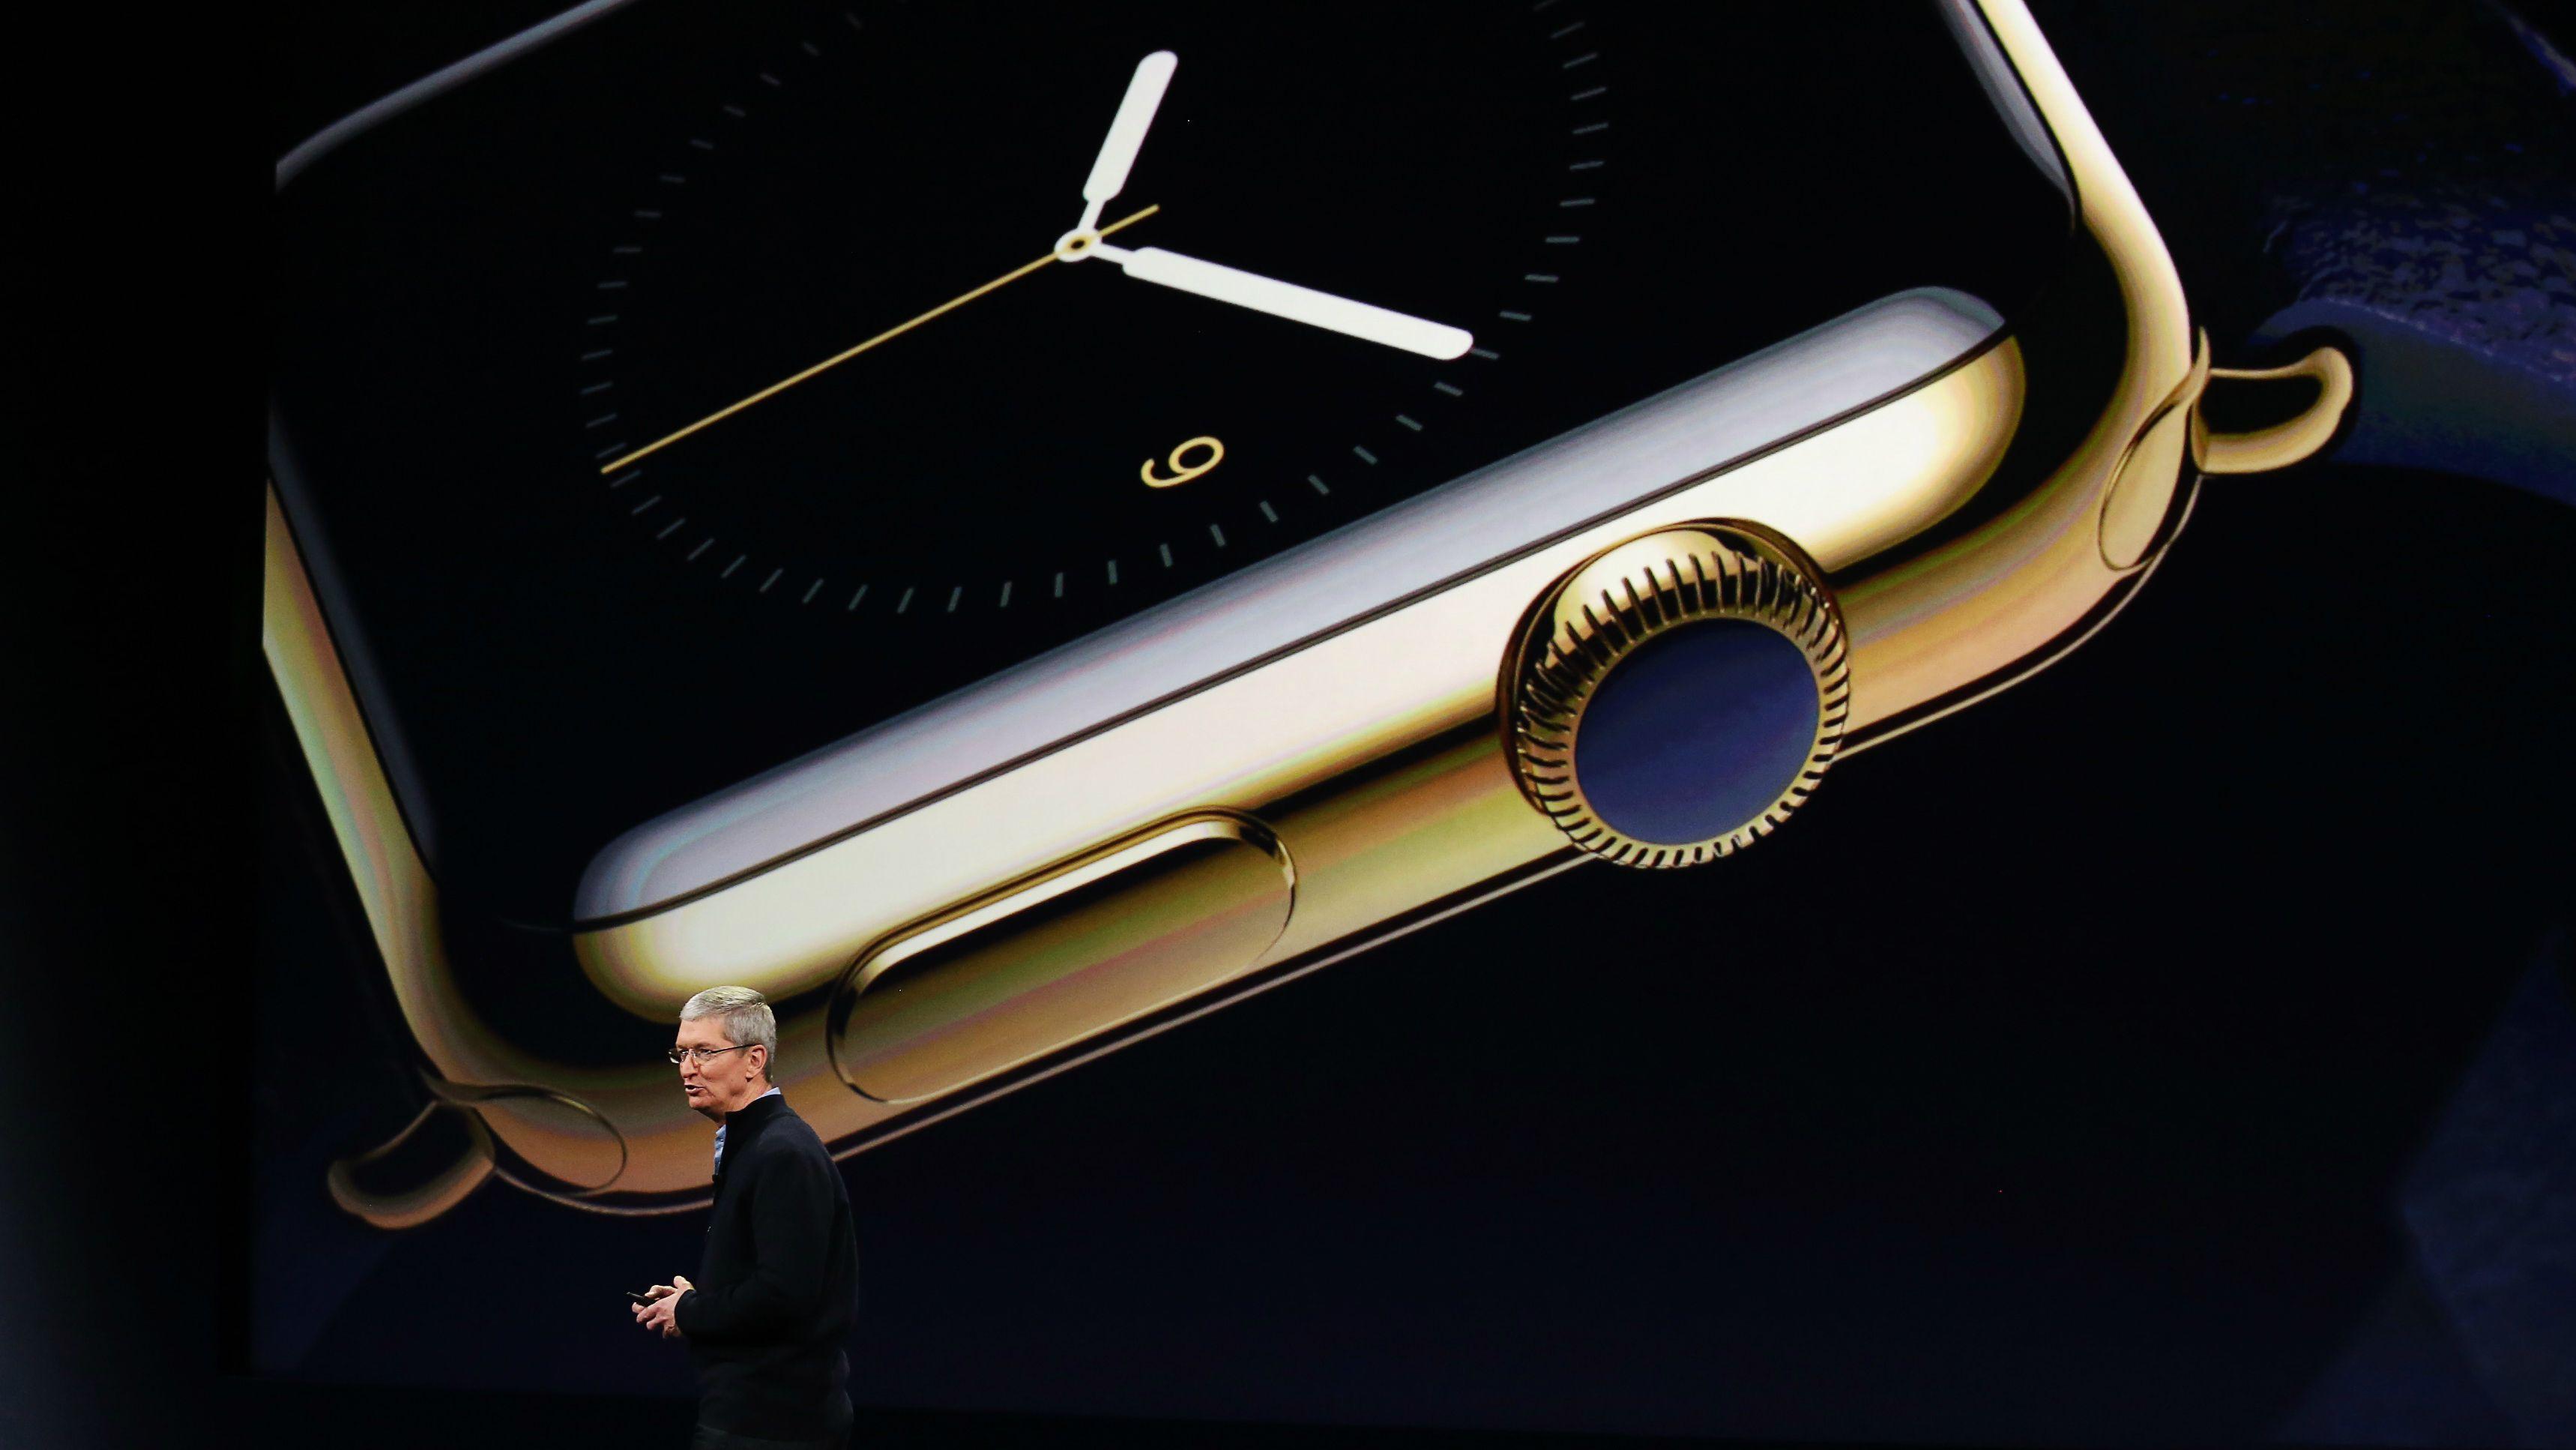 The gold Apple Watch is dead